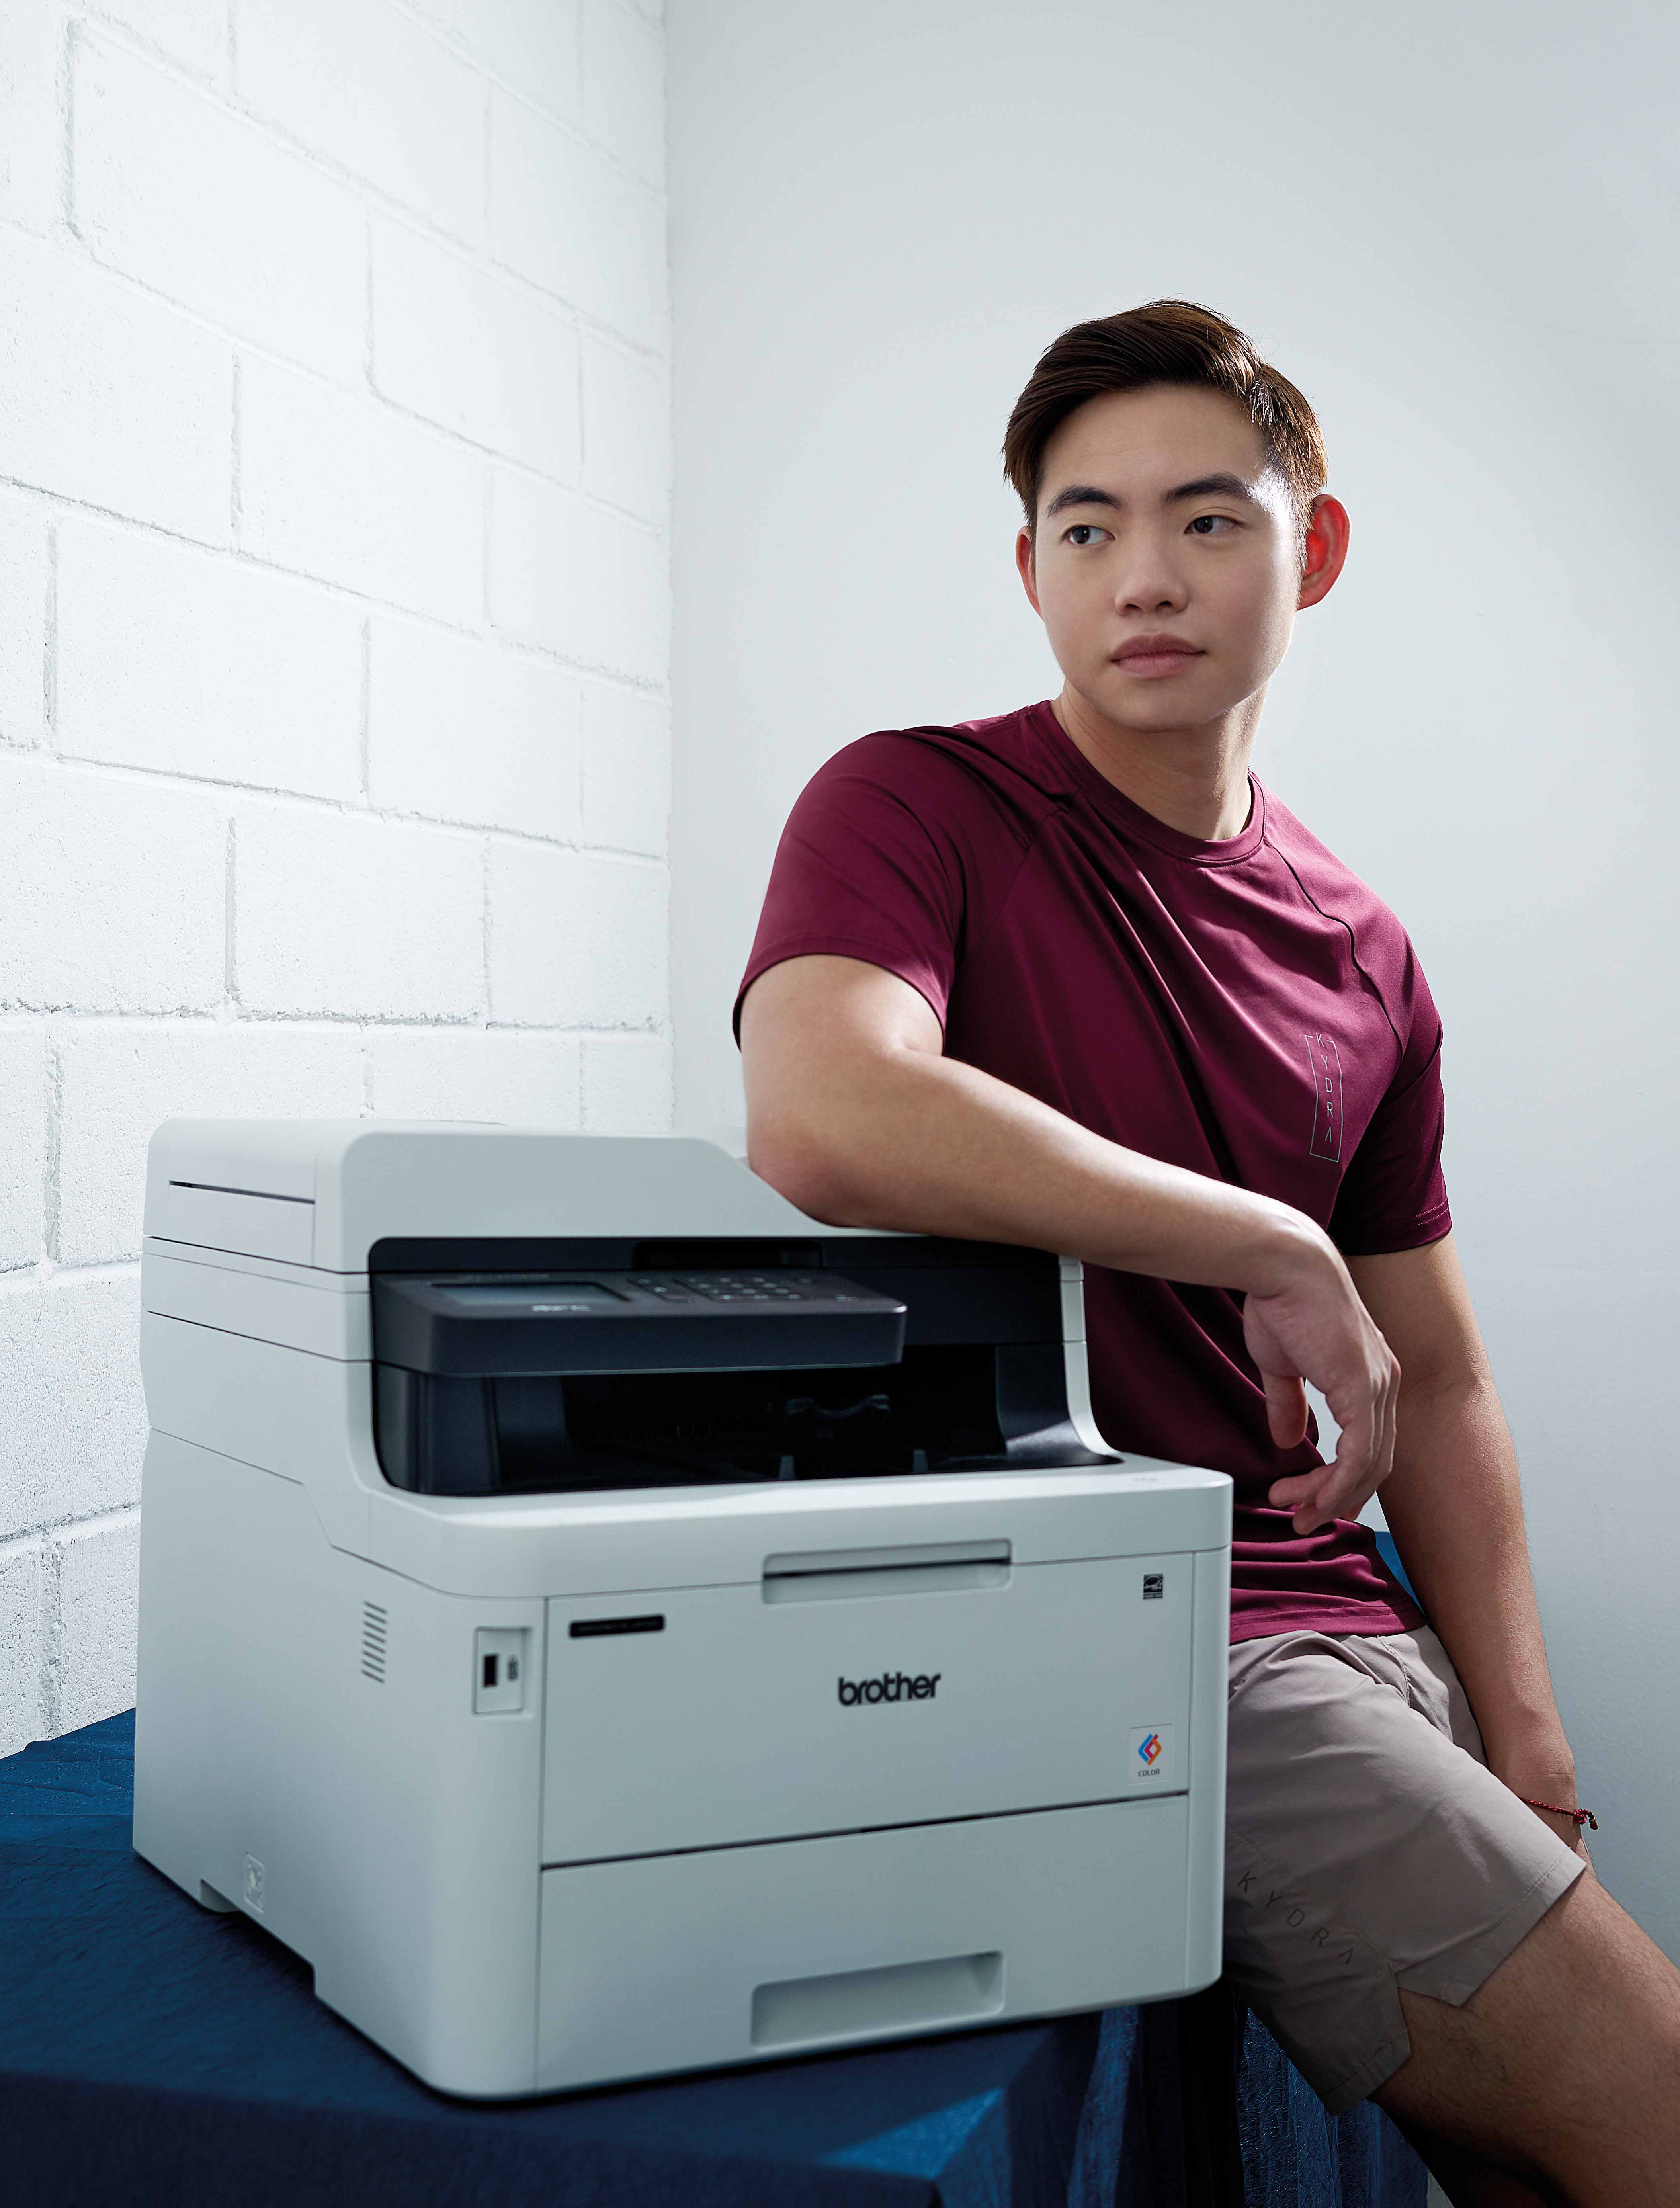 Brother MFC printer